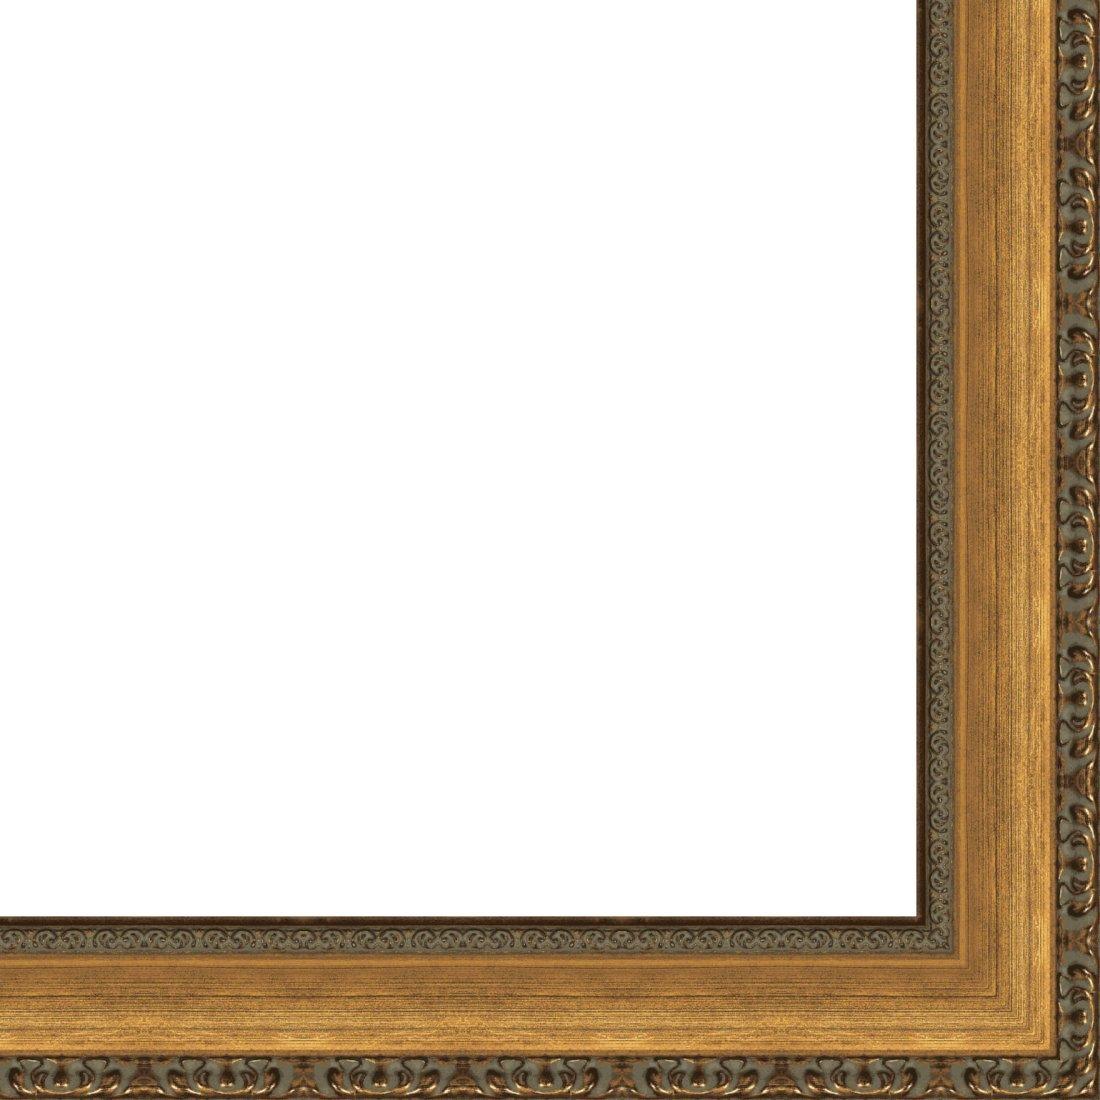 Picture Frame Moulding (Wood) 18ft bundle - Traditional Antique Gold Finish - 2.75'' width - 7/16'' rabbet depth